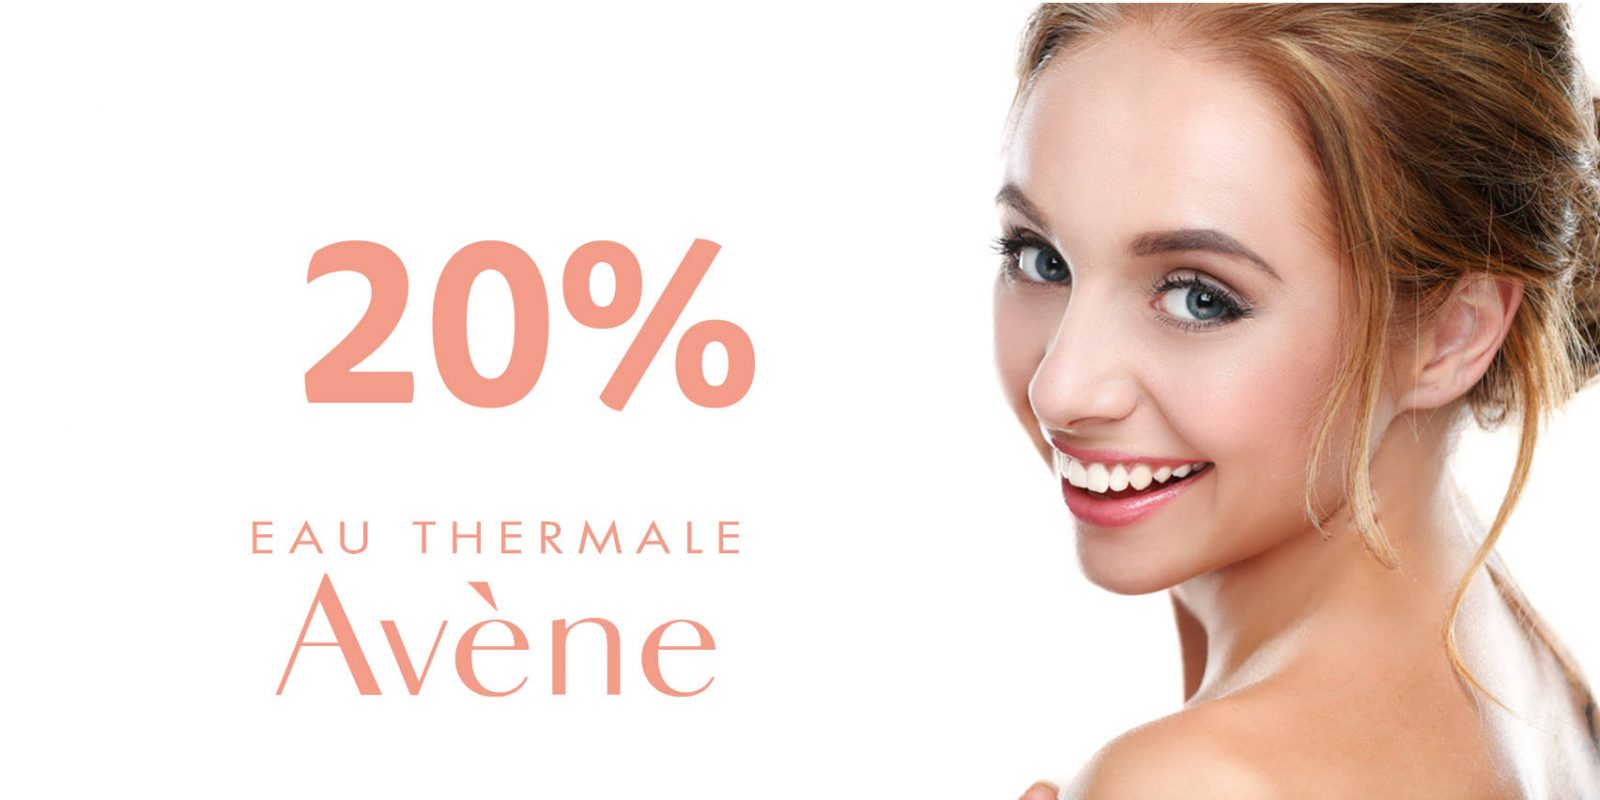 Avene-Kosmetik-Tage im September 2021